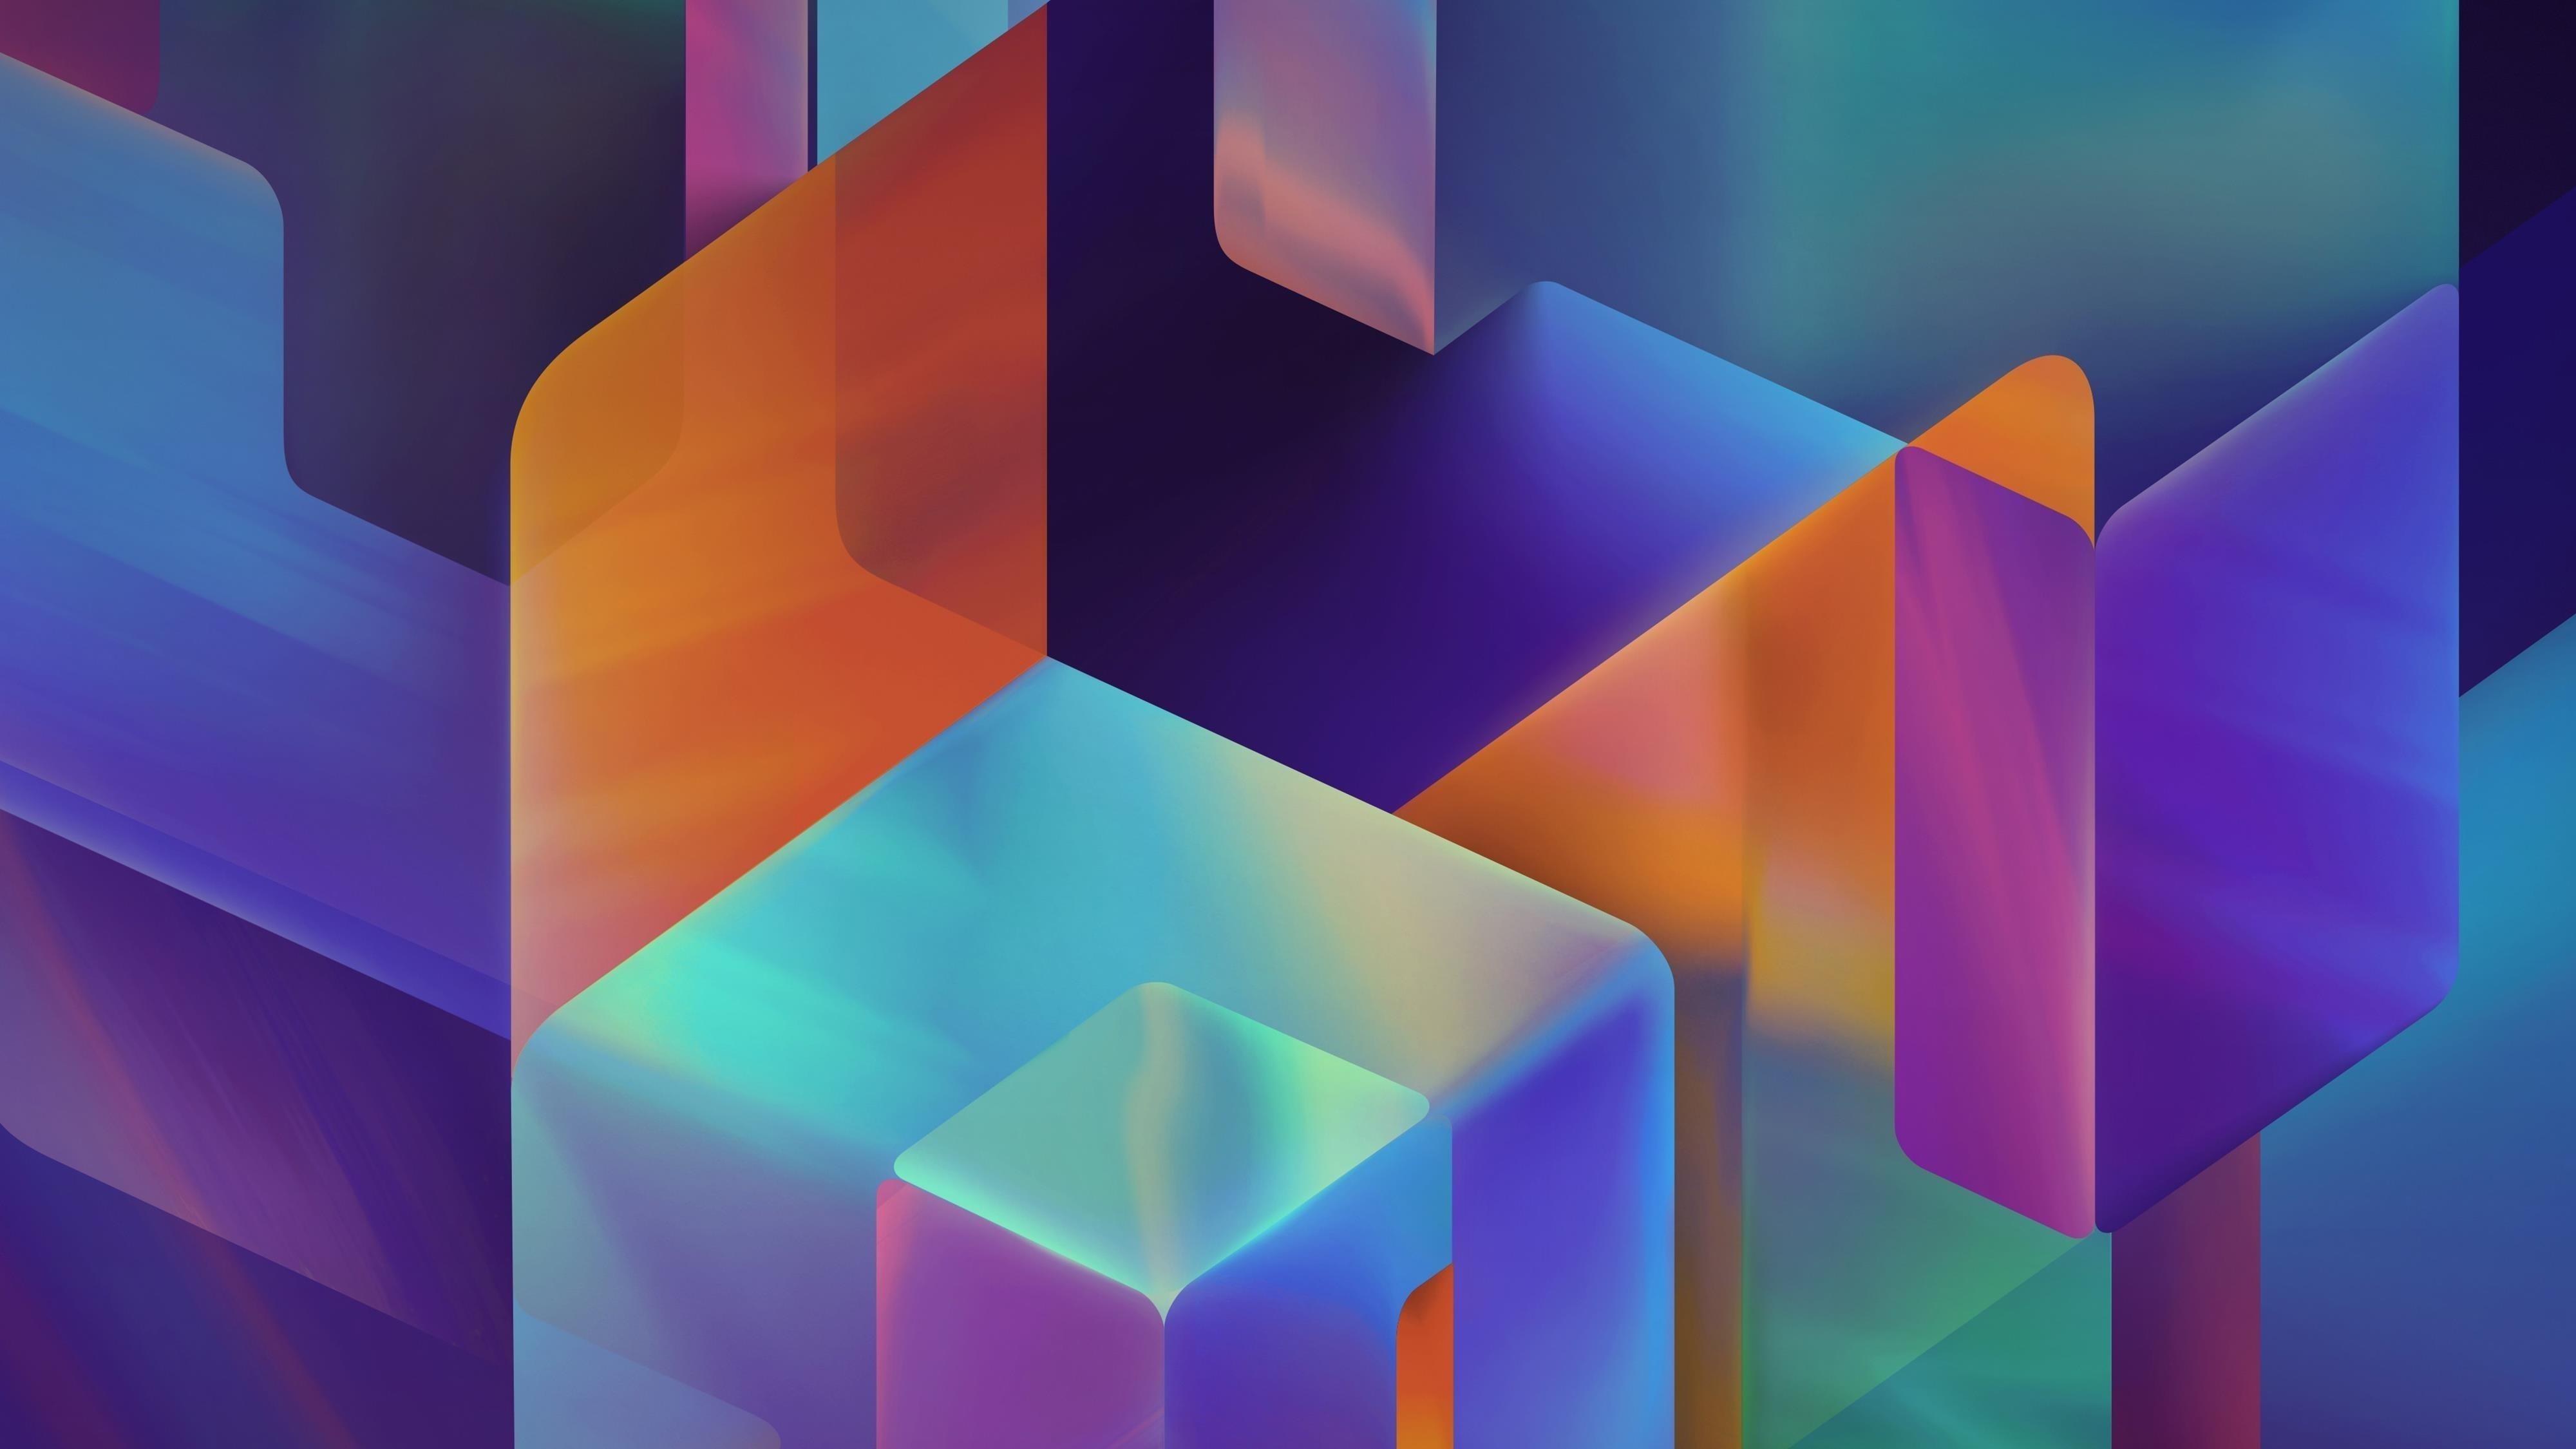 Android nexus stock abstract обои скачать